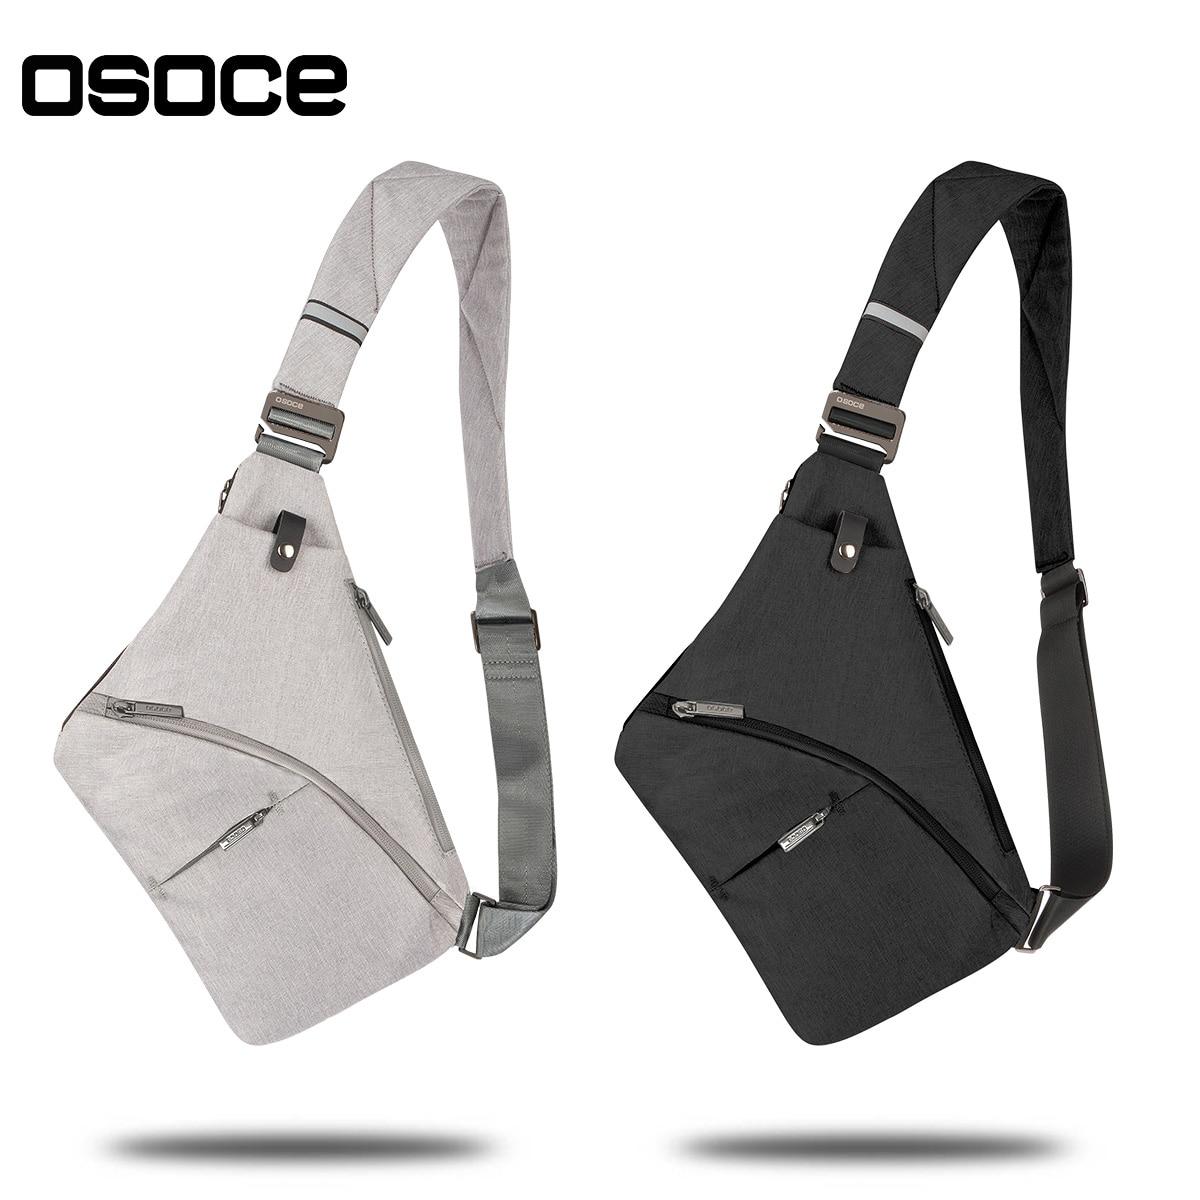 Anti-Theft Crossbody Bag Shoulder Bag Sling Chest bag Waterproof Cover Pack Rucksack Bicycle Sport 1